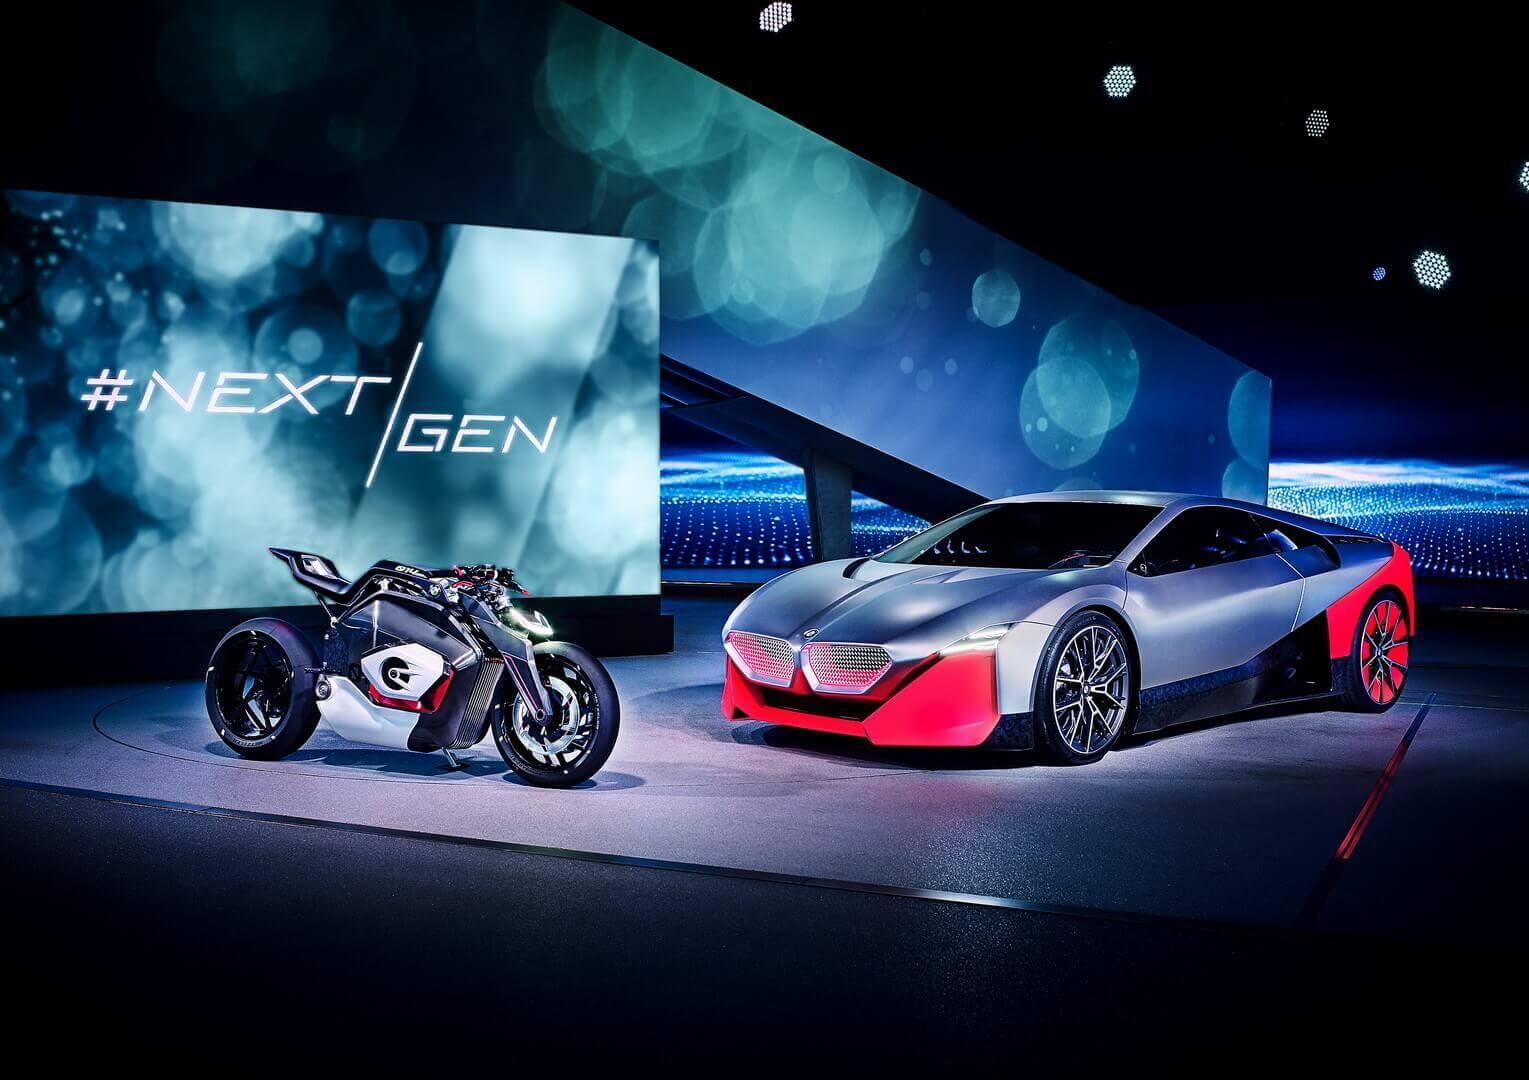 Электрический мотоцикл Vision DC Roadster и плагин-гибрид Vision M NEXT